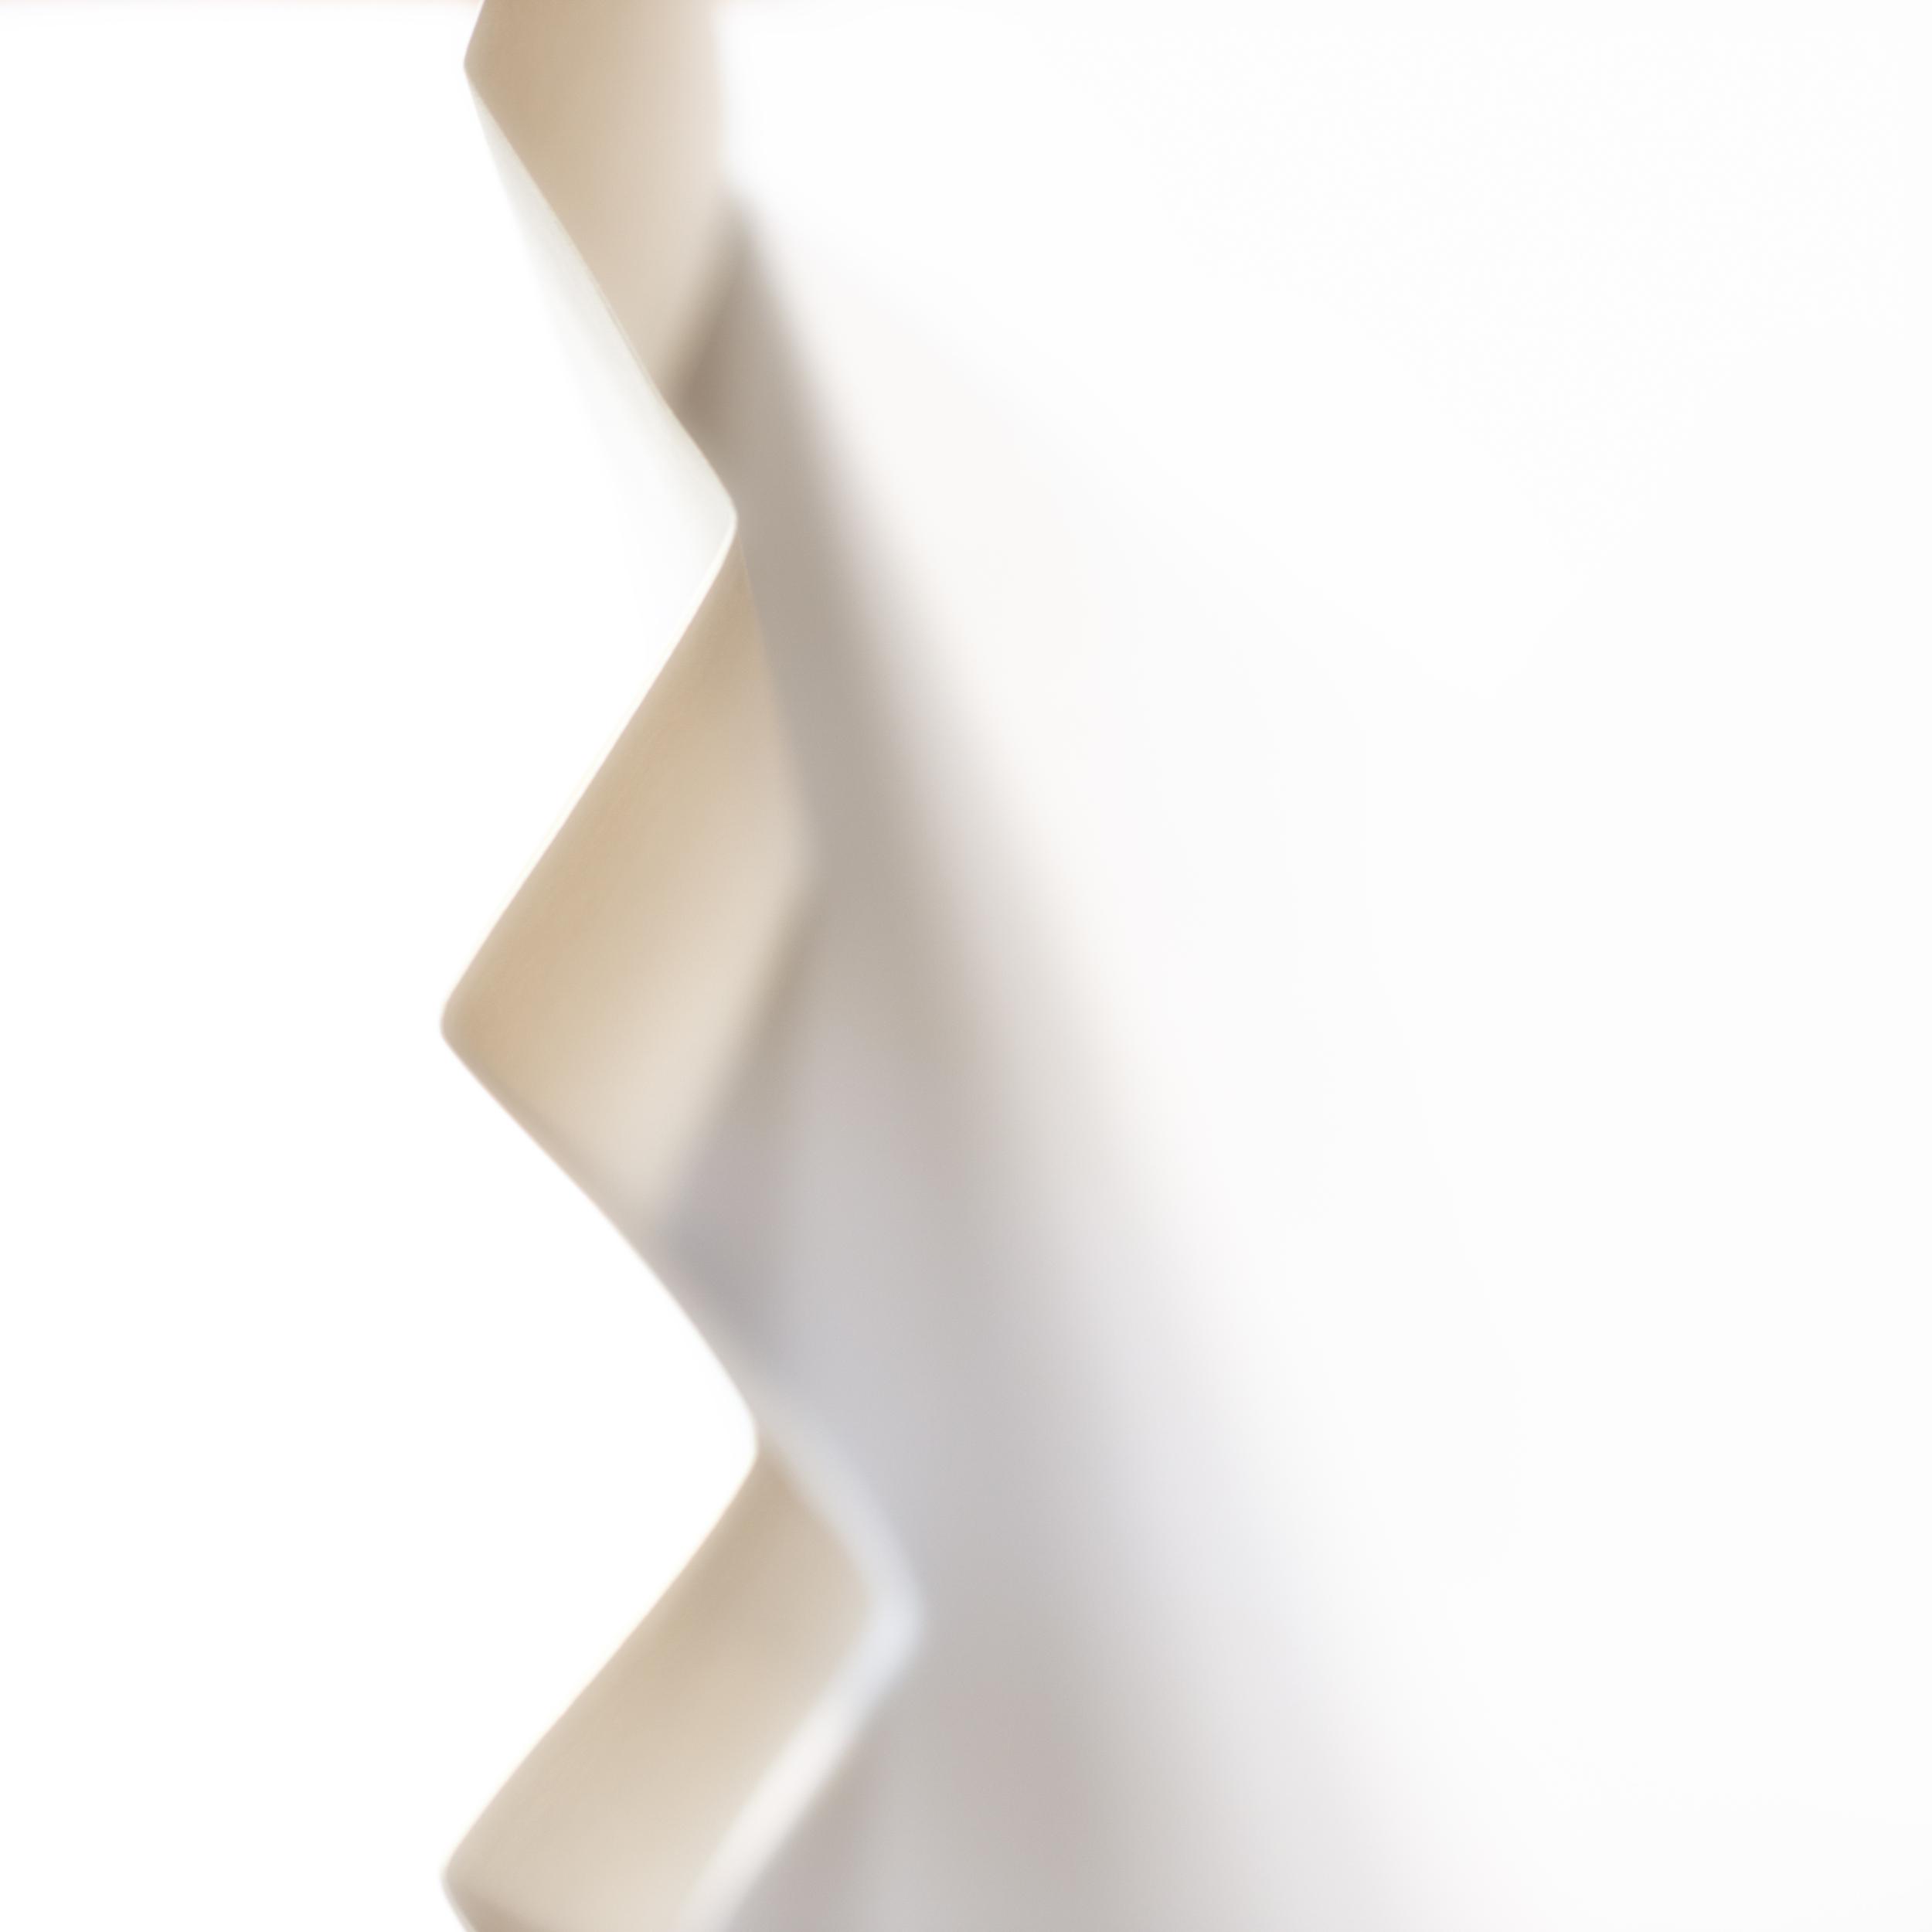 PH601_Paper_Final_Zigzag_final.jpg